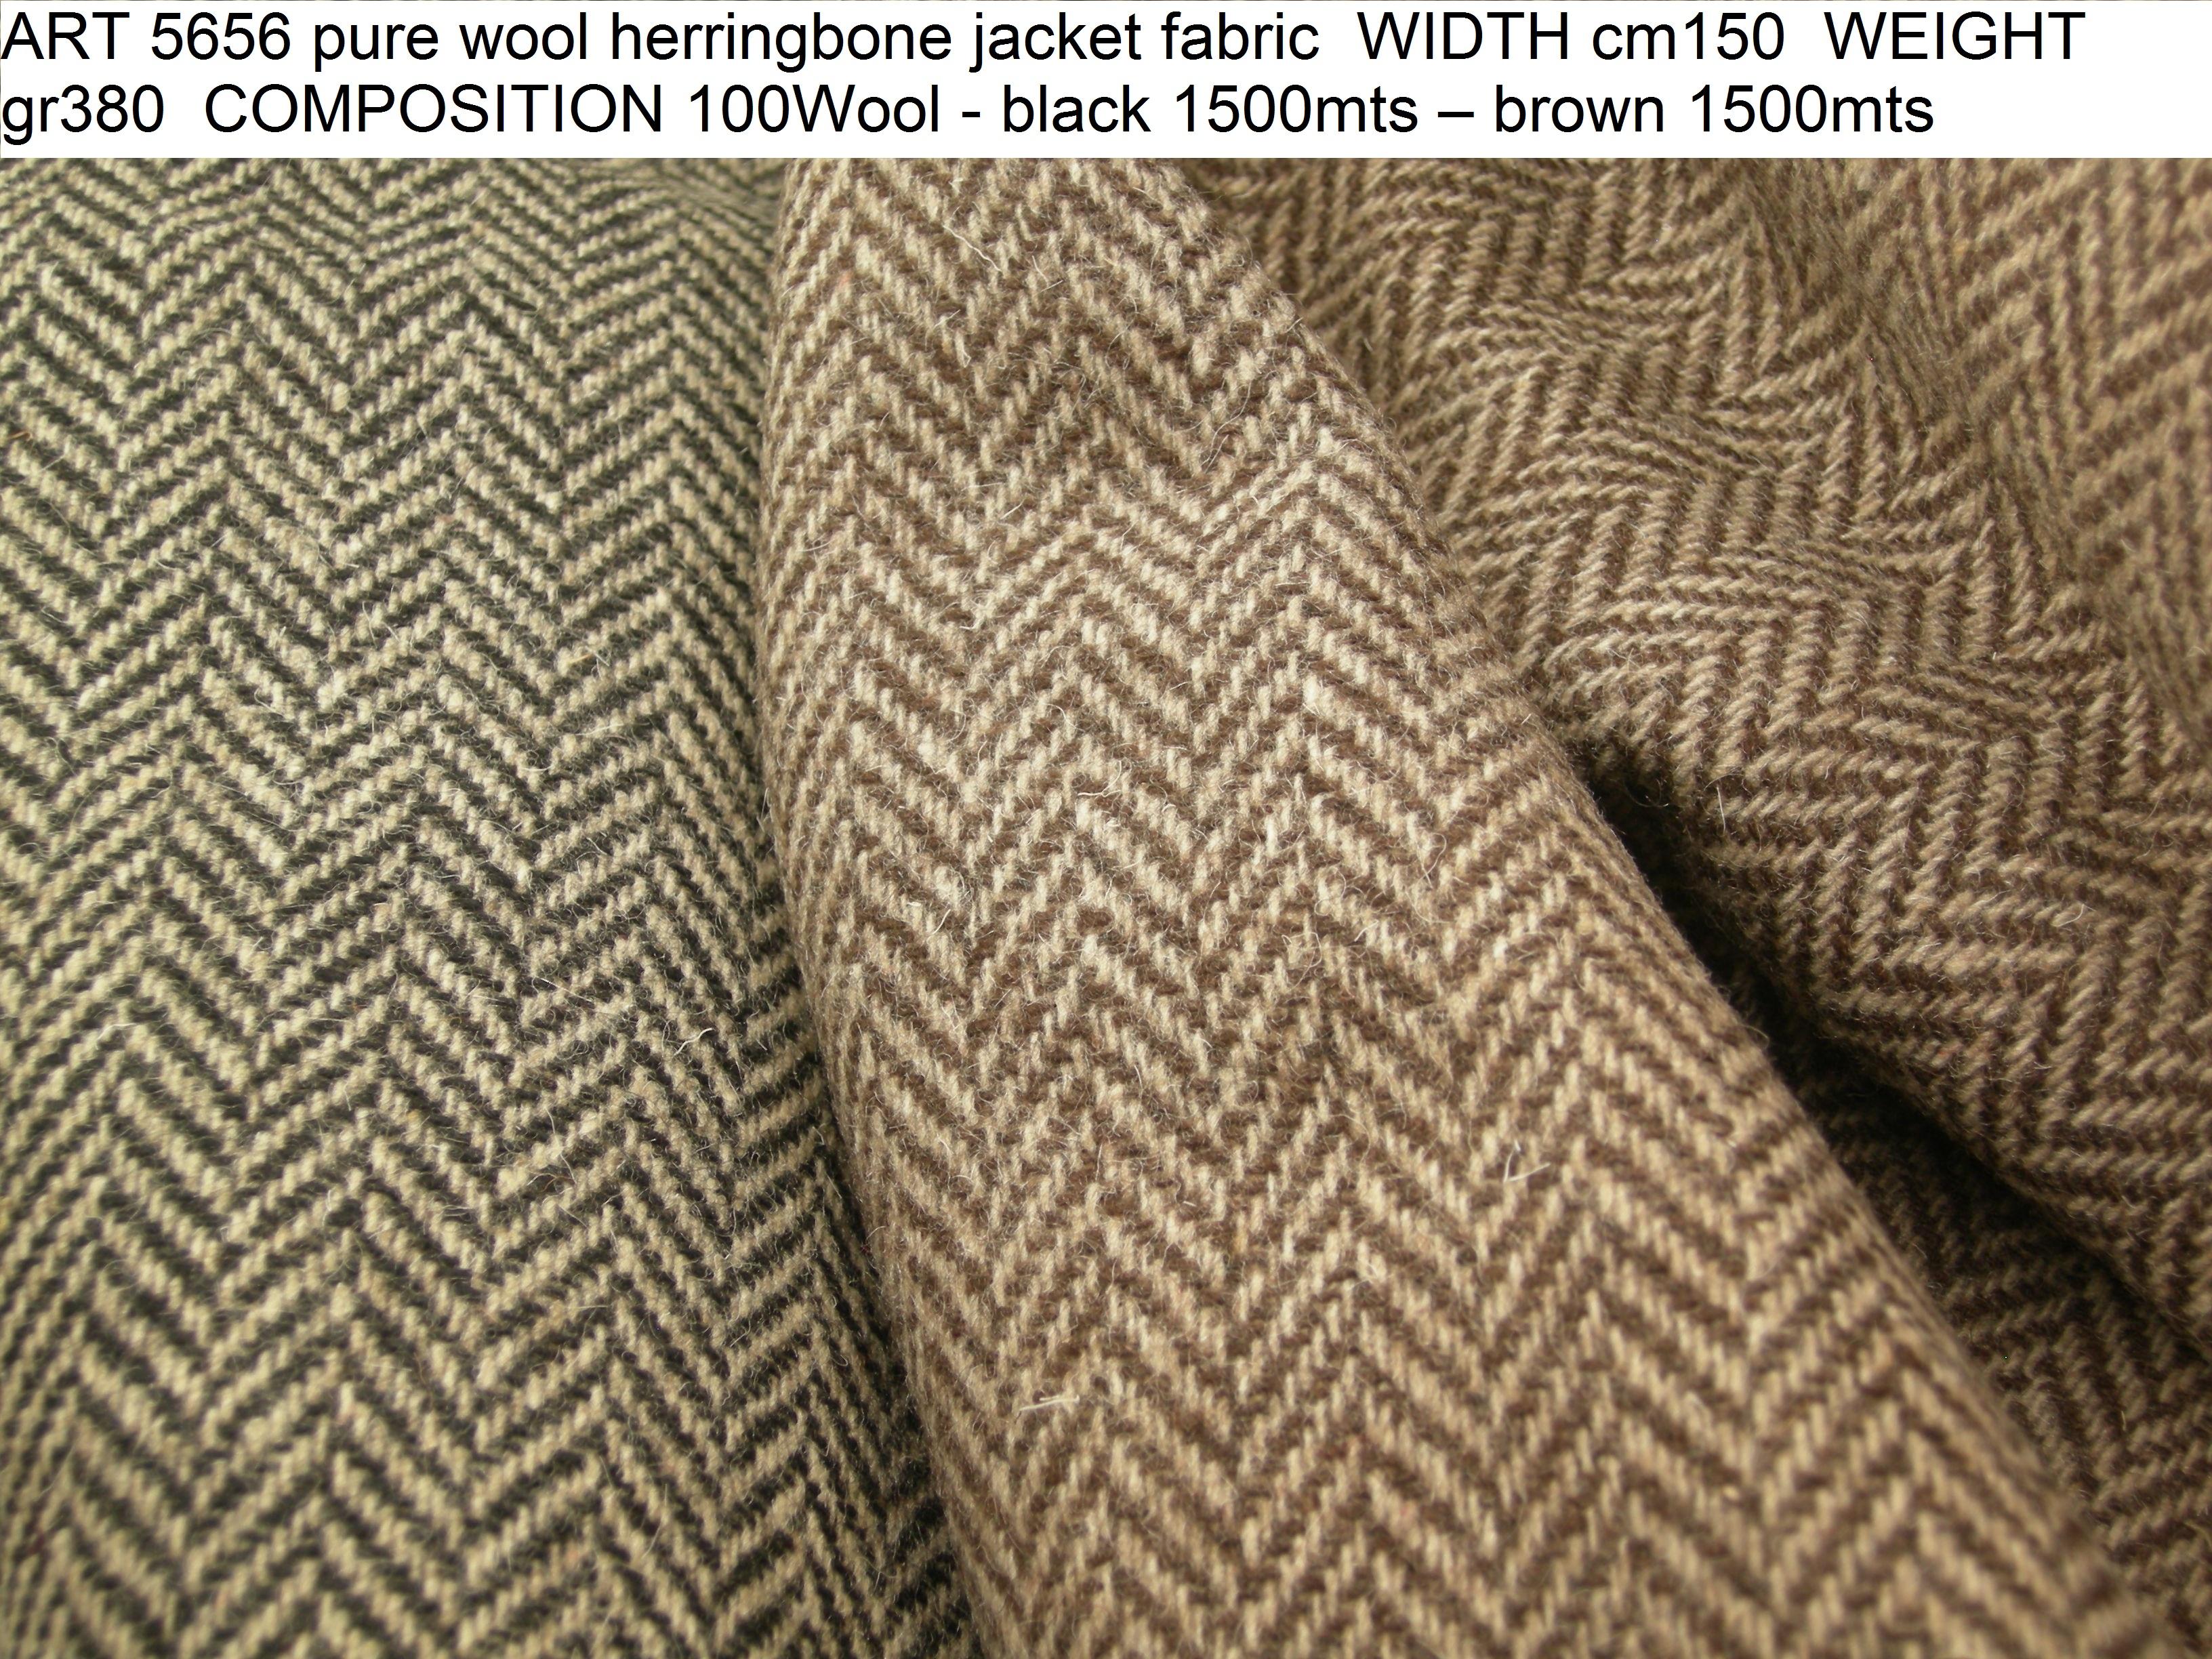 ART 5656 pure wool herringbone jacket fabric WIDTH cm150 WEIGHT gr380 COMPOSITION 100Wool - black 1500mts – brown 1500mts